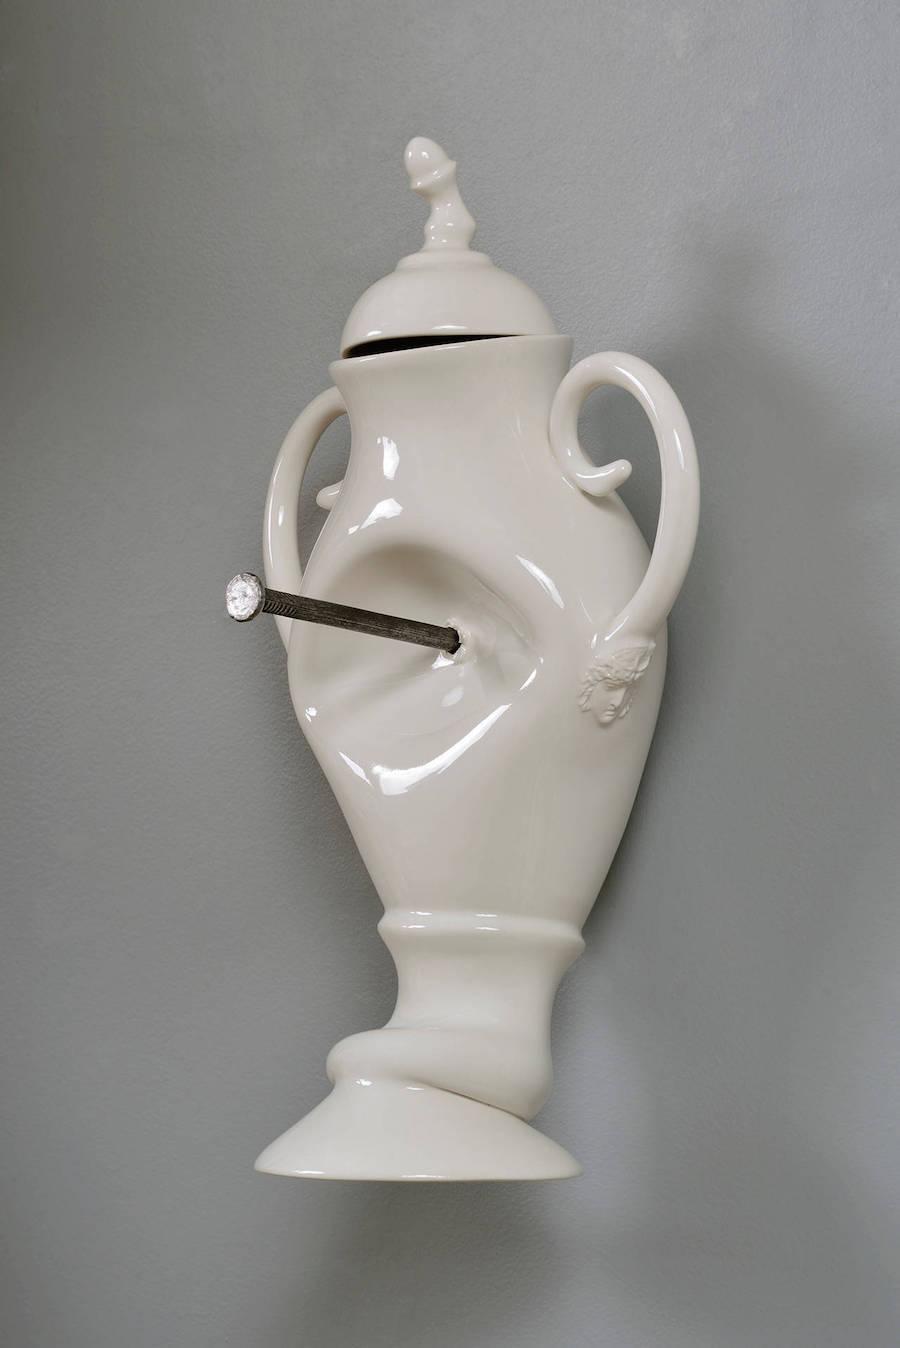 Porcelain Vessels Pummeled in Unfortunate Accidents by Laurent Craste